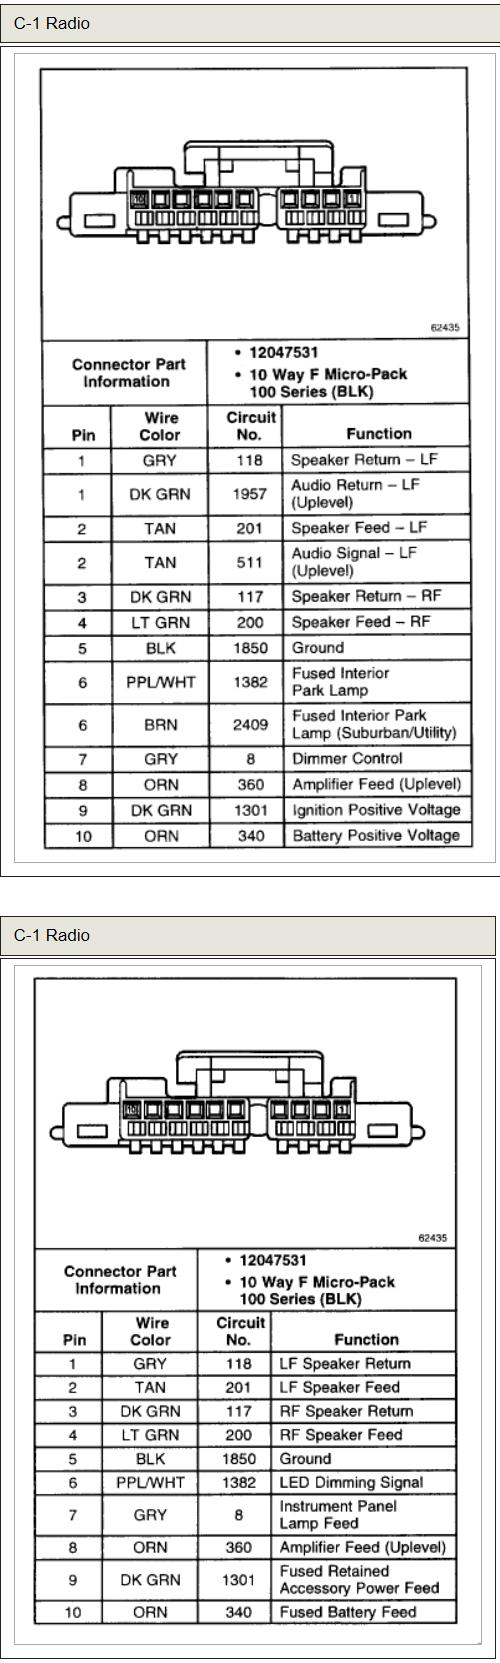 Sensational Dodge Omni Stereo Wiring Diagram Basic Electronics Wiring Diagram Wiring Cloud Onicaxeromohammedshrineorg